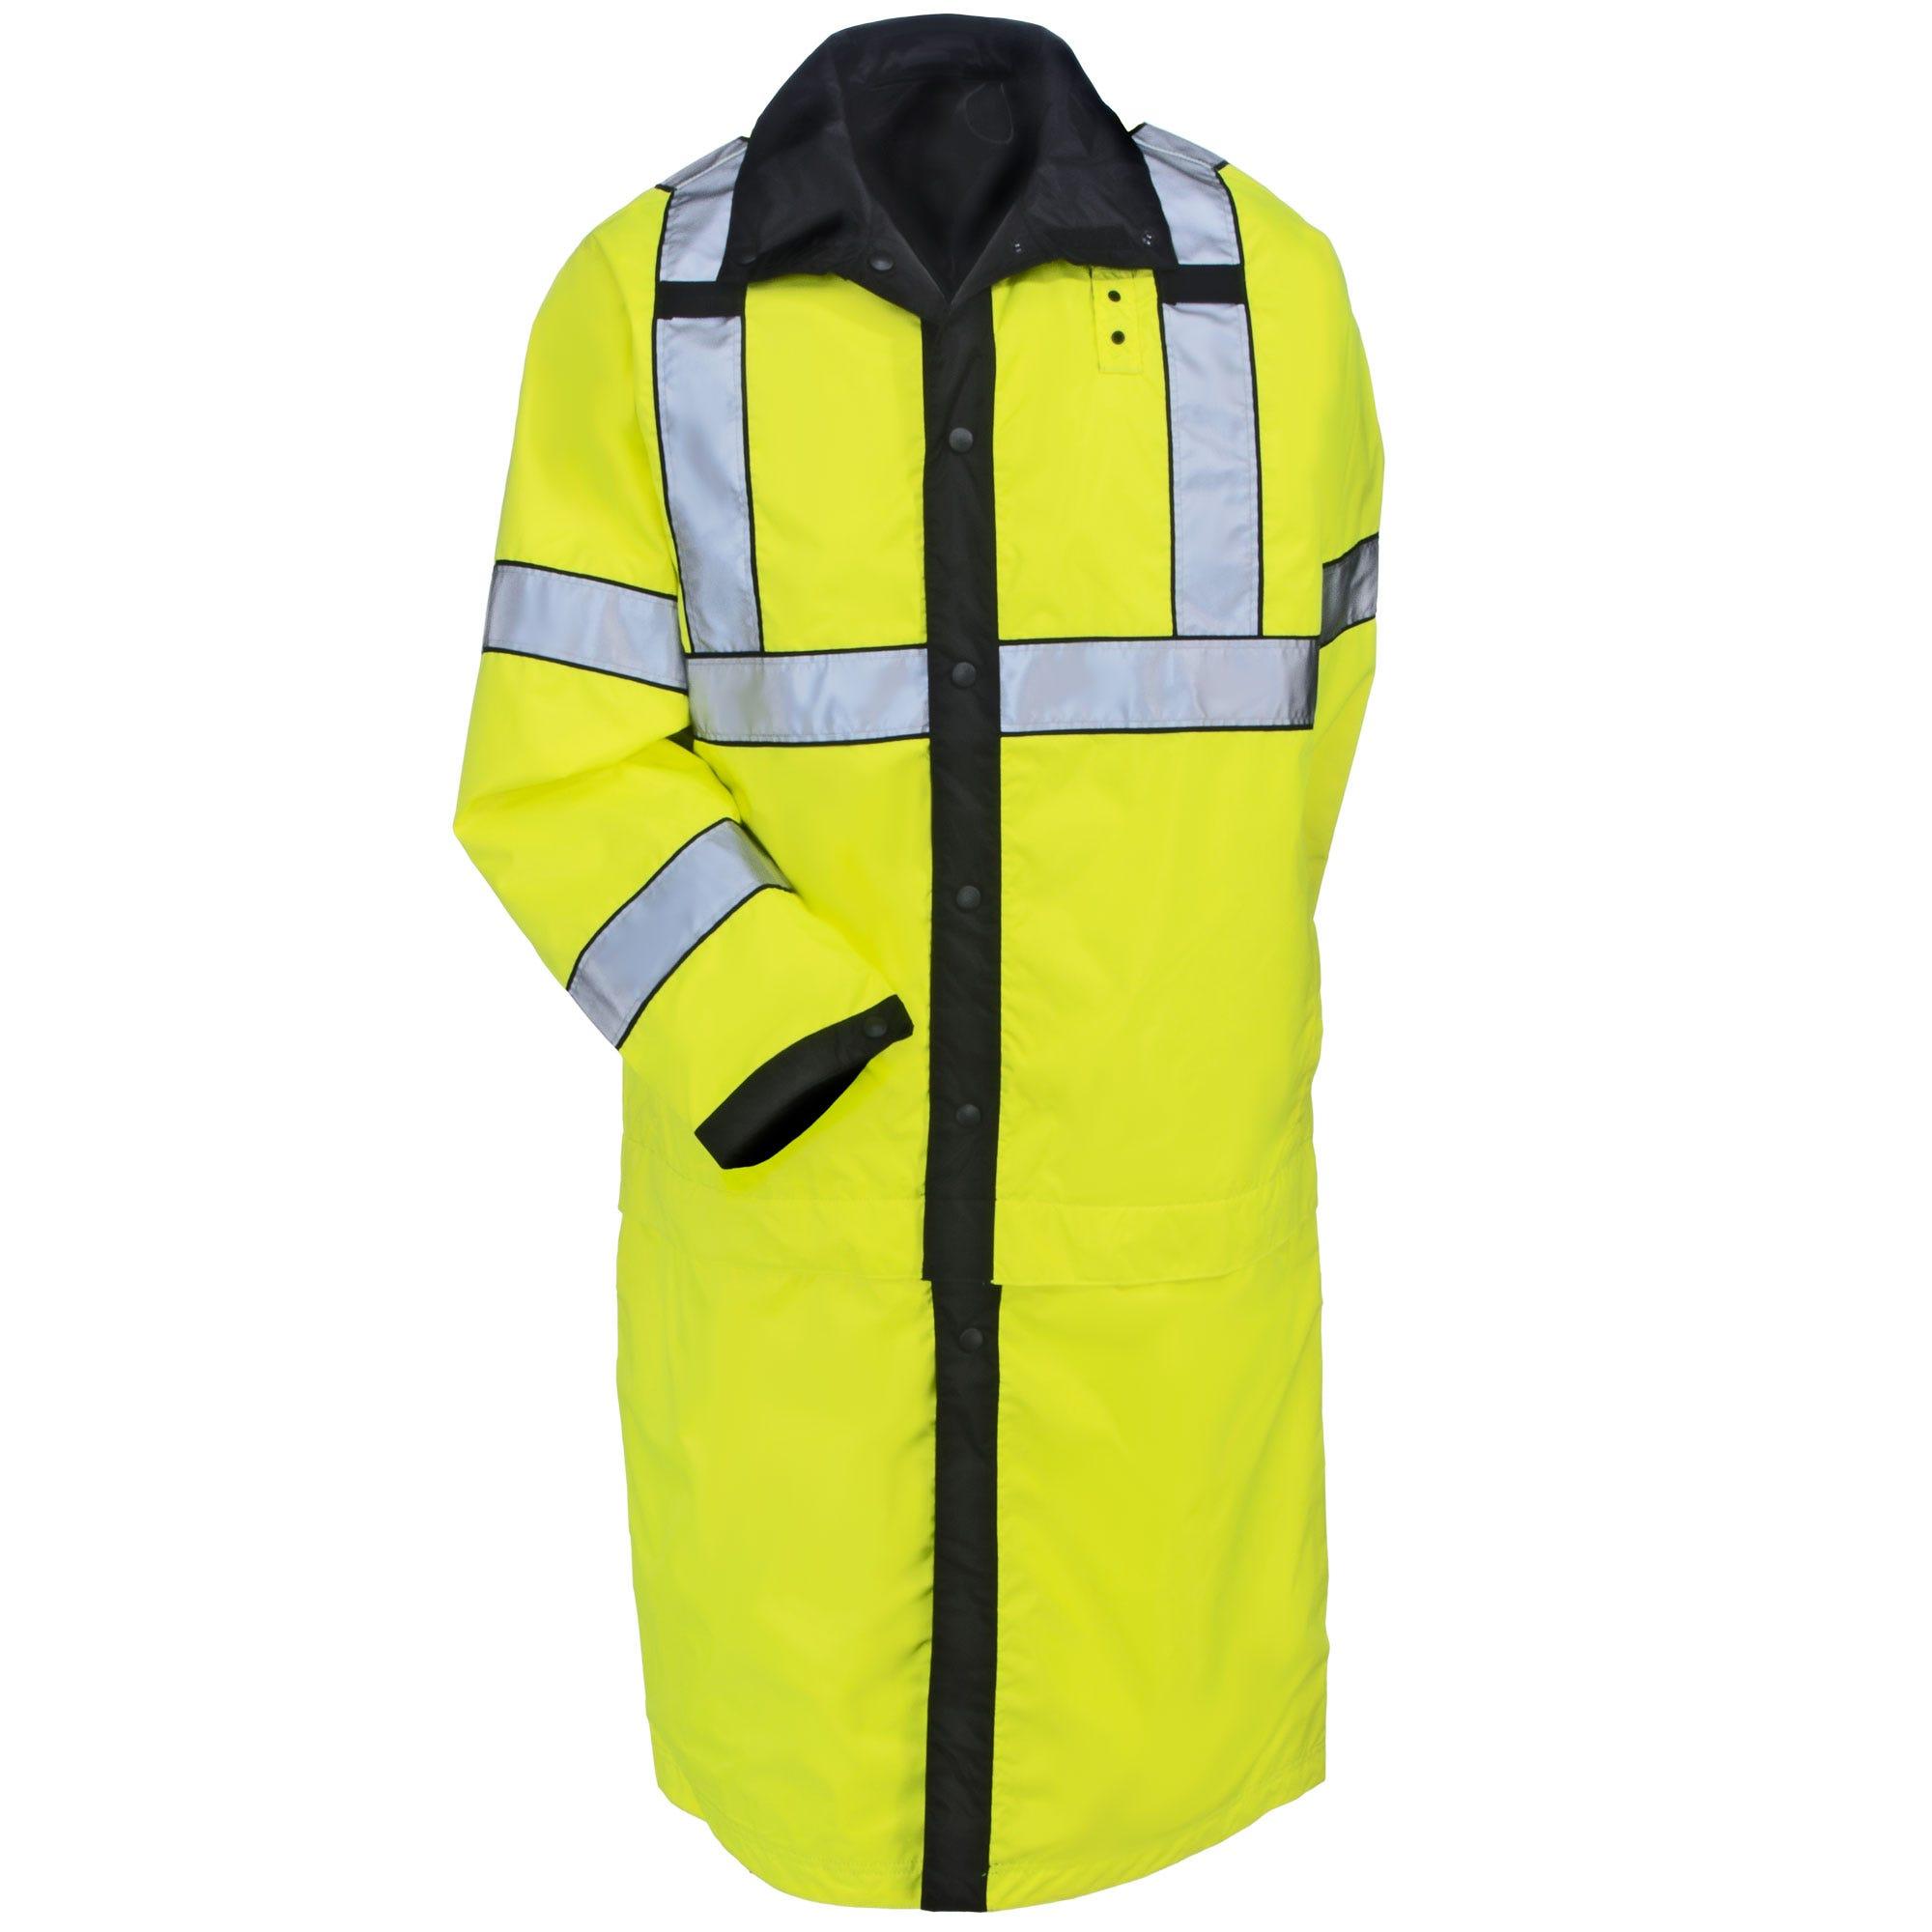 5.11 Tactical Coats: Men's 48125 019 Black High Vis Waterproof Reversible Rain Coat thumbnail